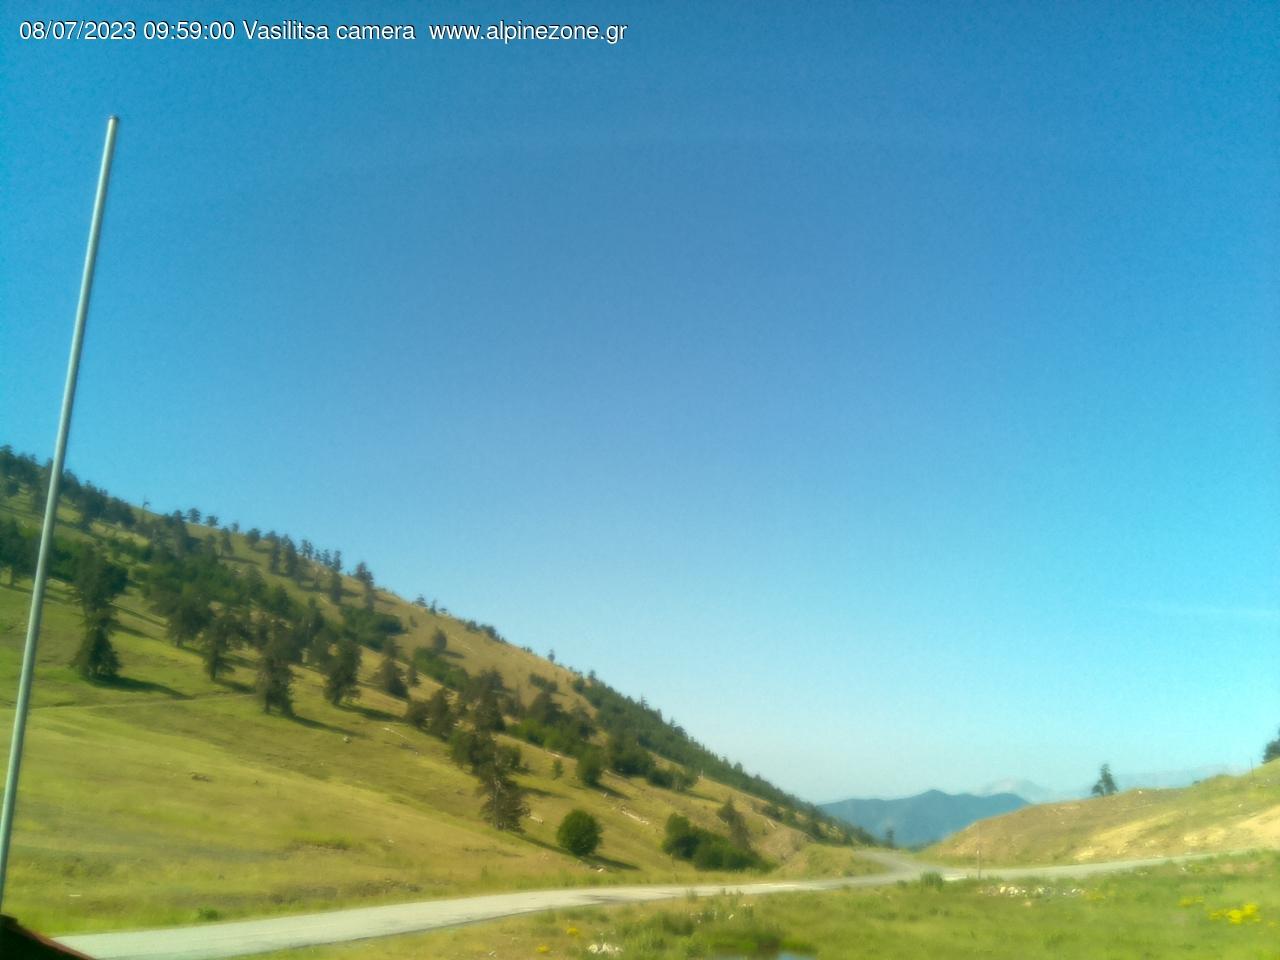 Vasilitsa Alpine